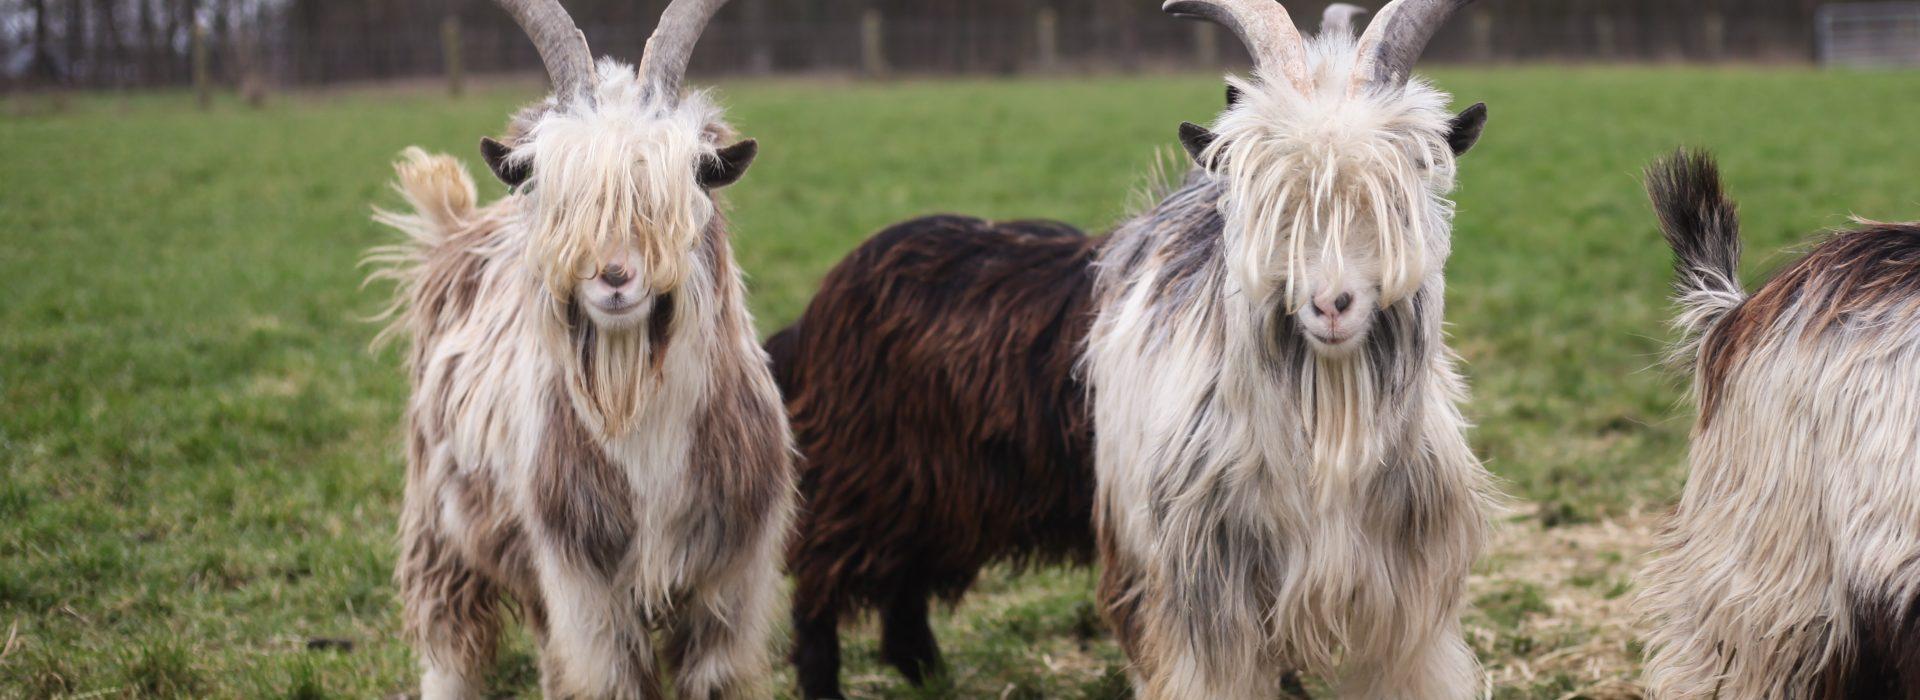 Zeldzame huisdierrassen beschermd bij dierziekten